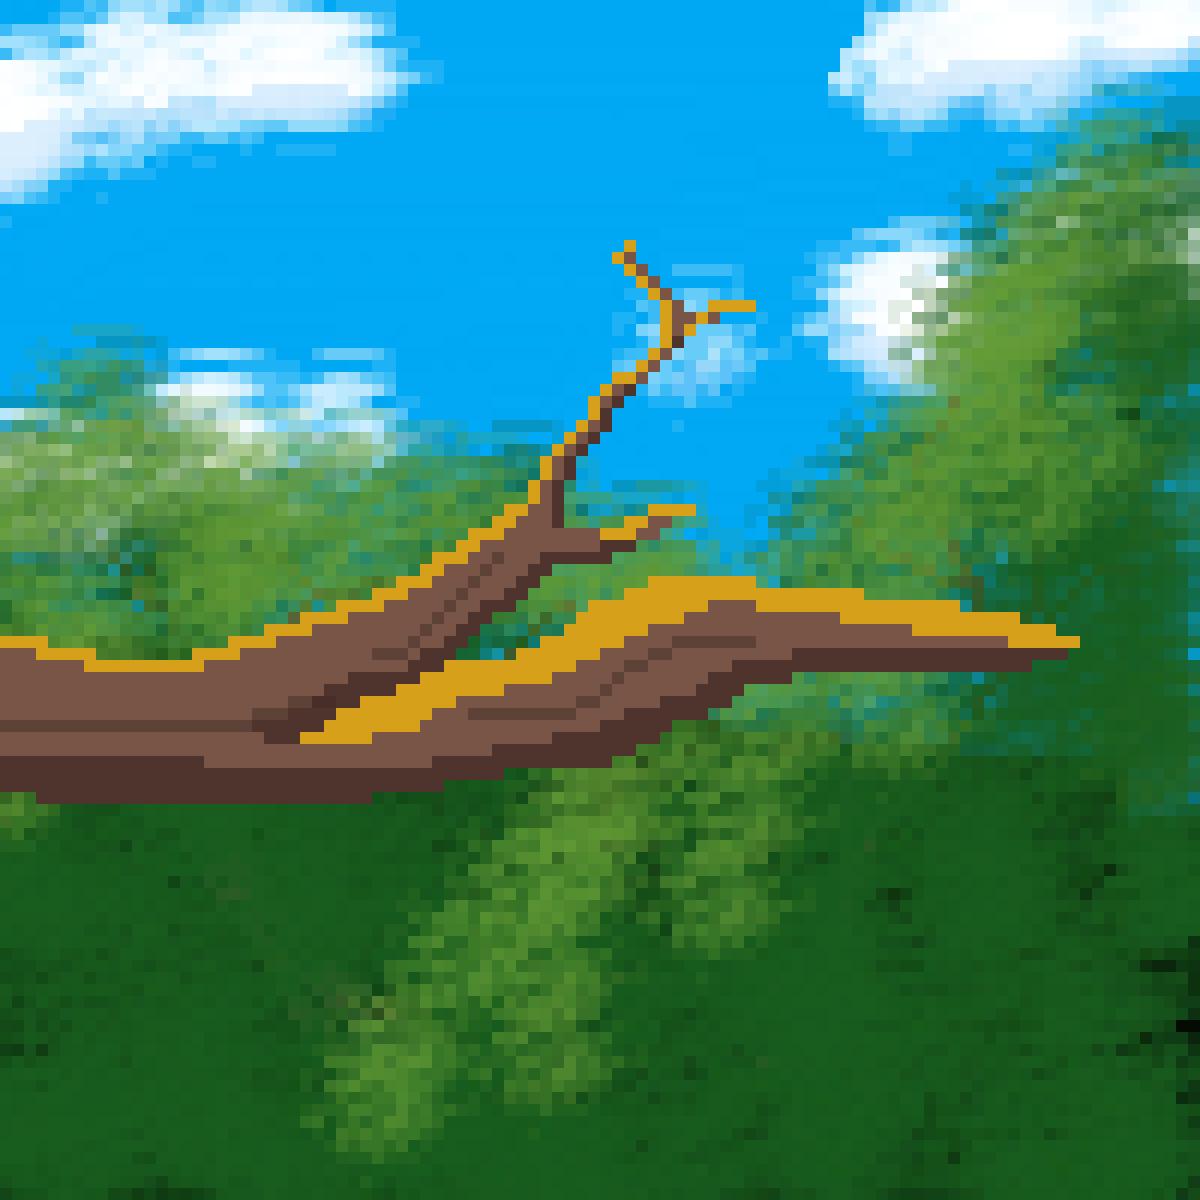 TreeLimb (without bird yet) by VLPine